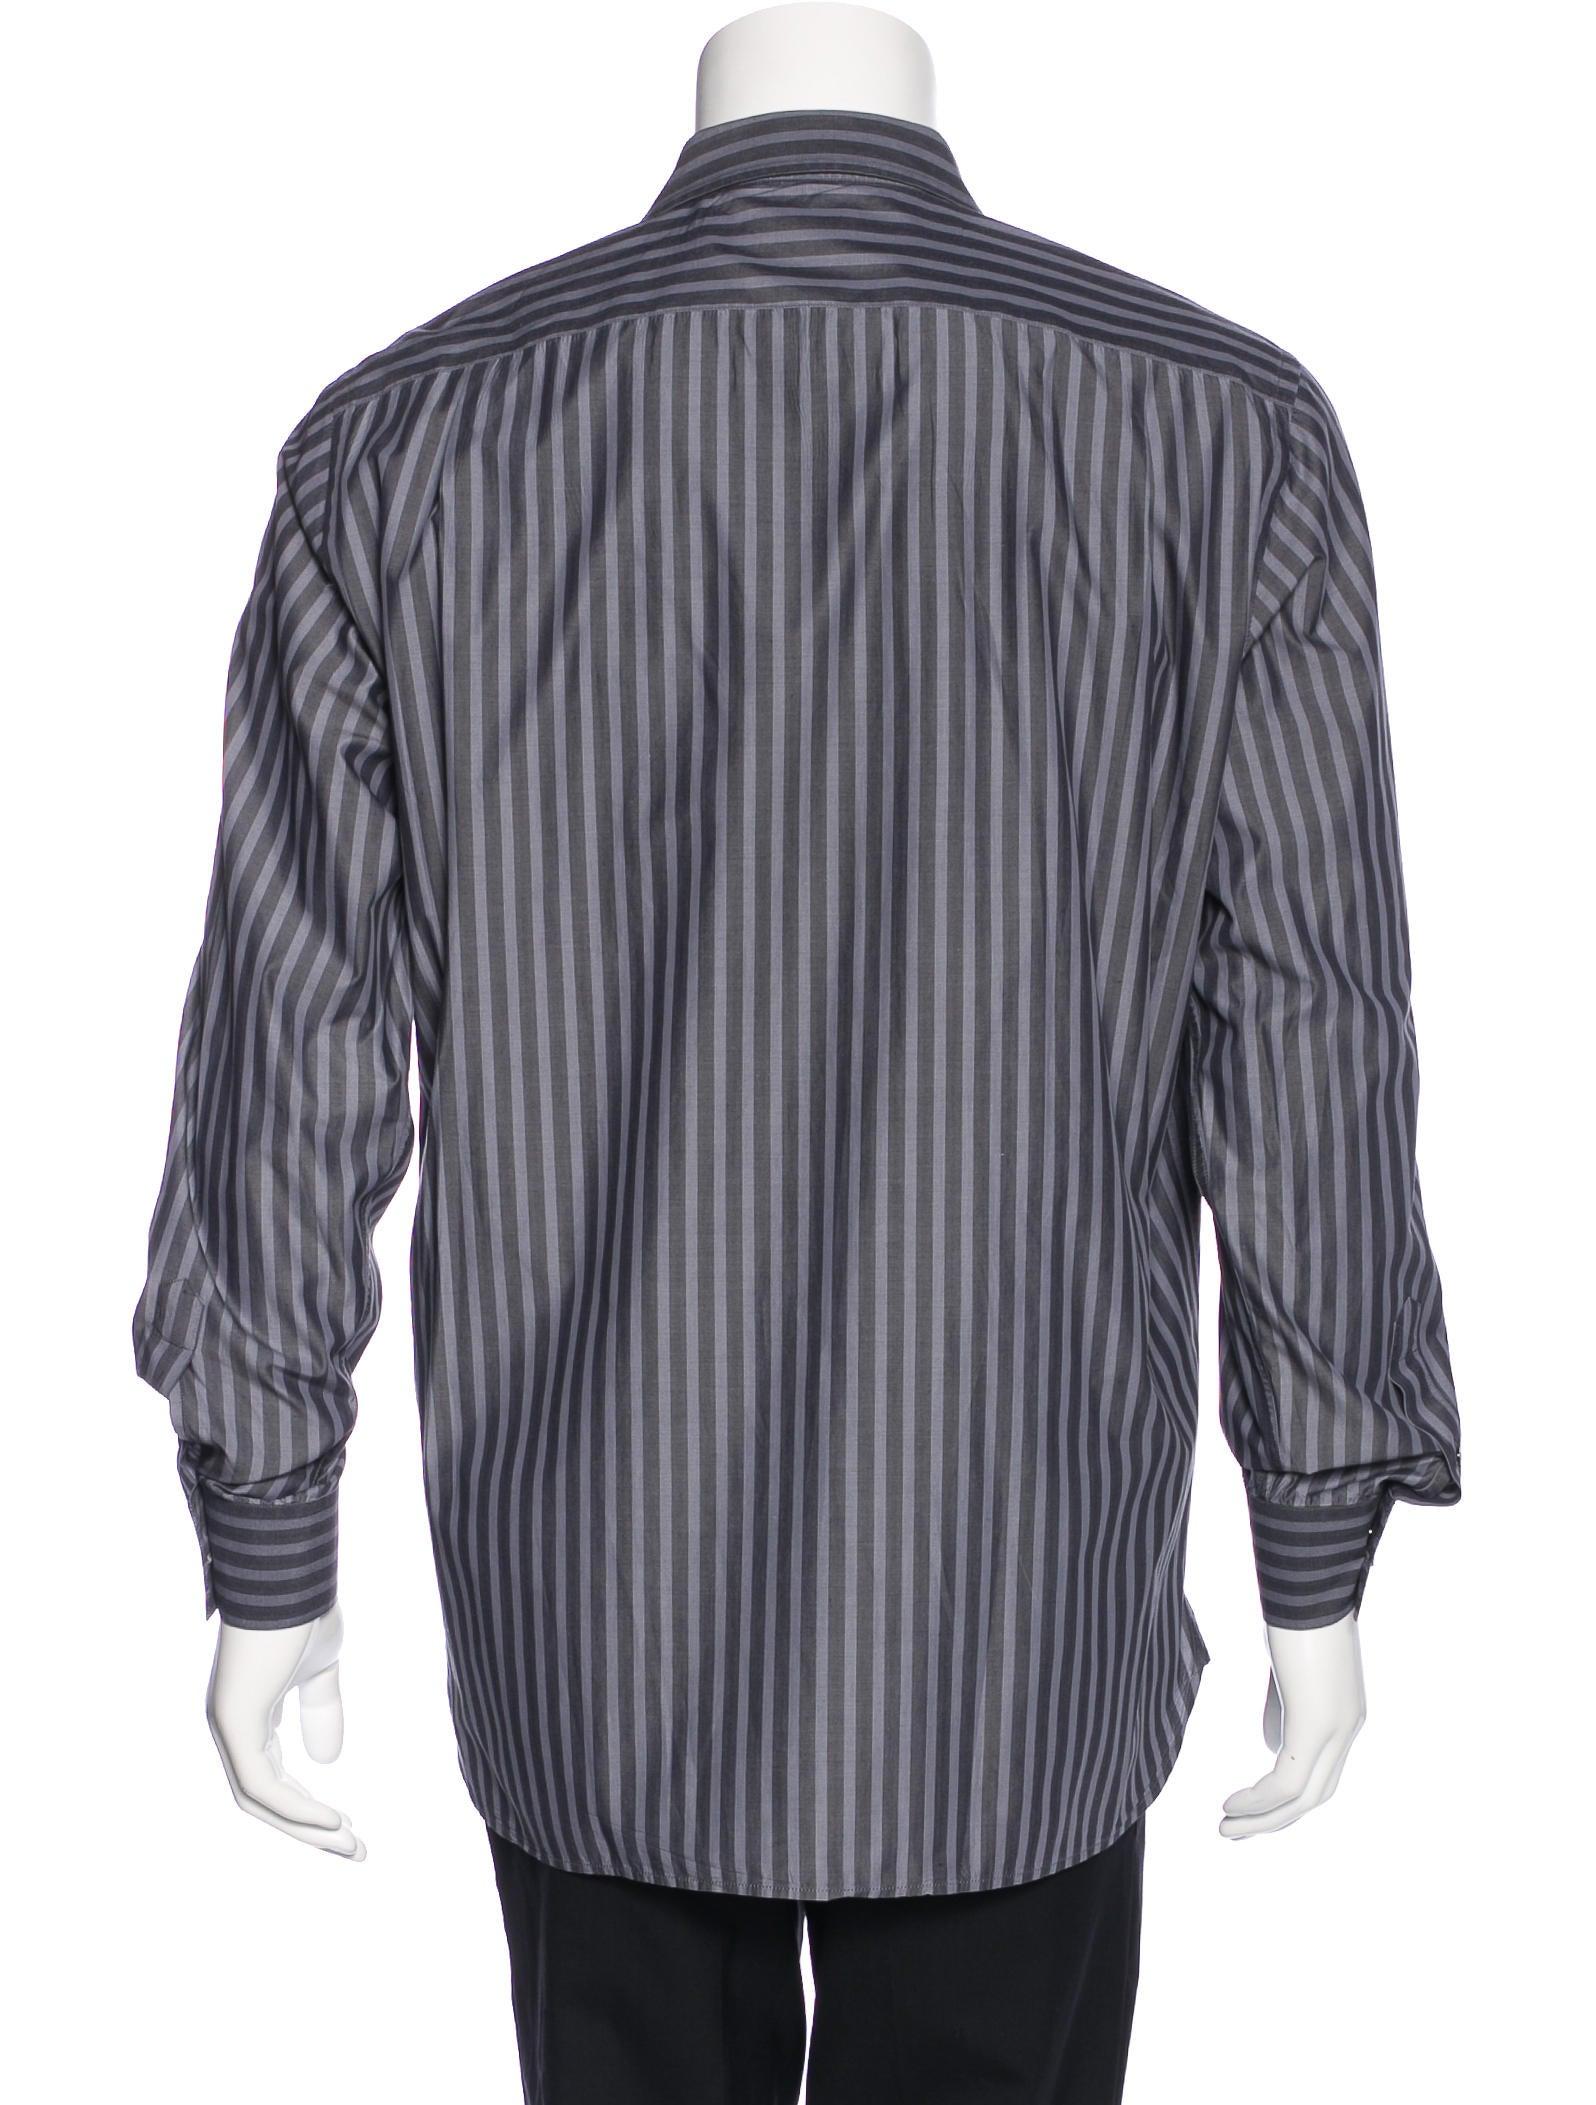 Burberry striped dress shirt mens shirts bur75449 for Mens big and tall burberry shirts